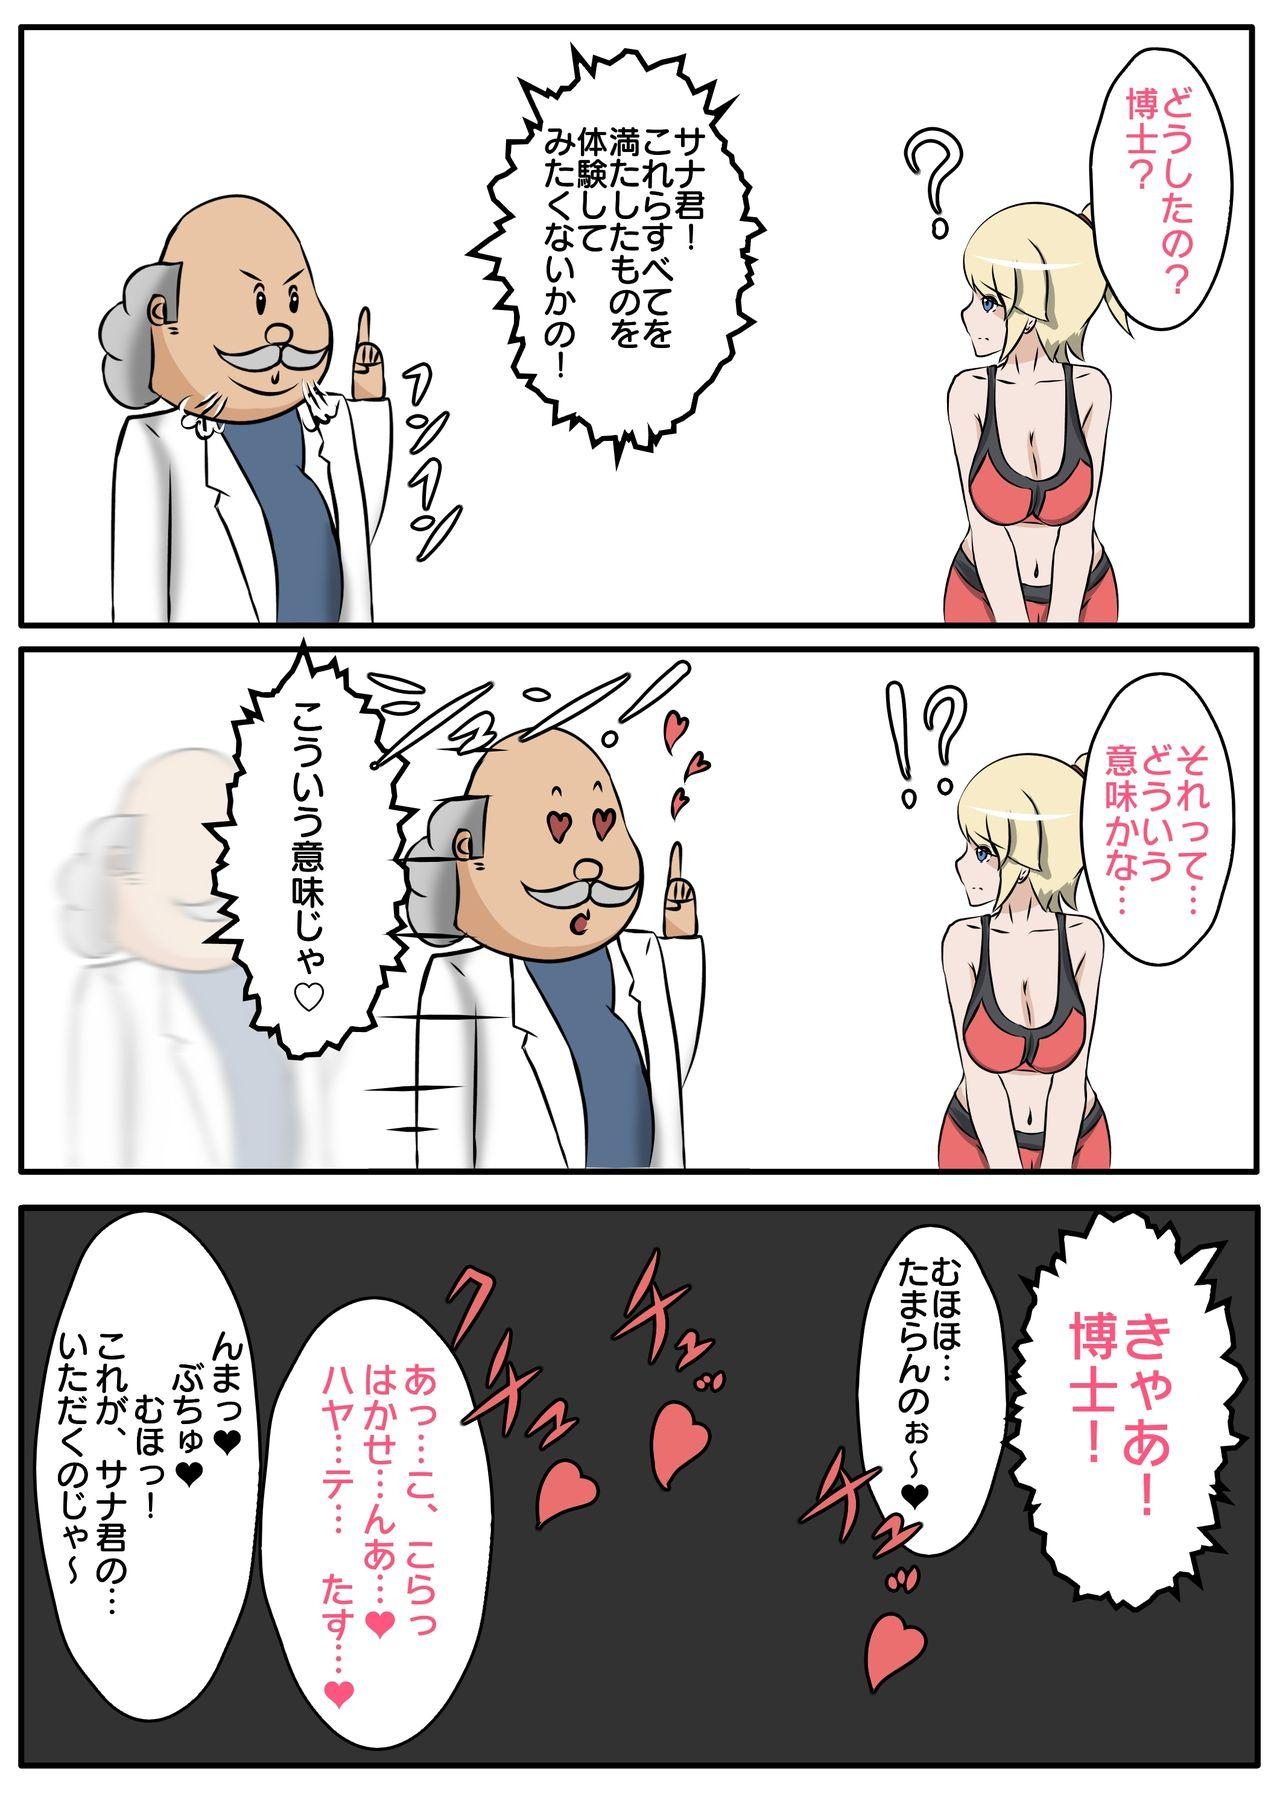 Nagusamex 58